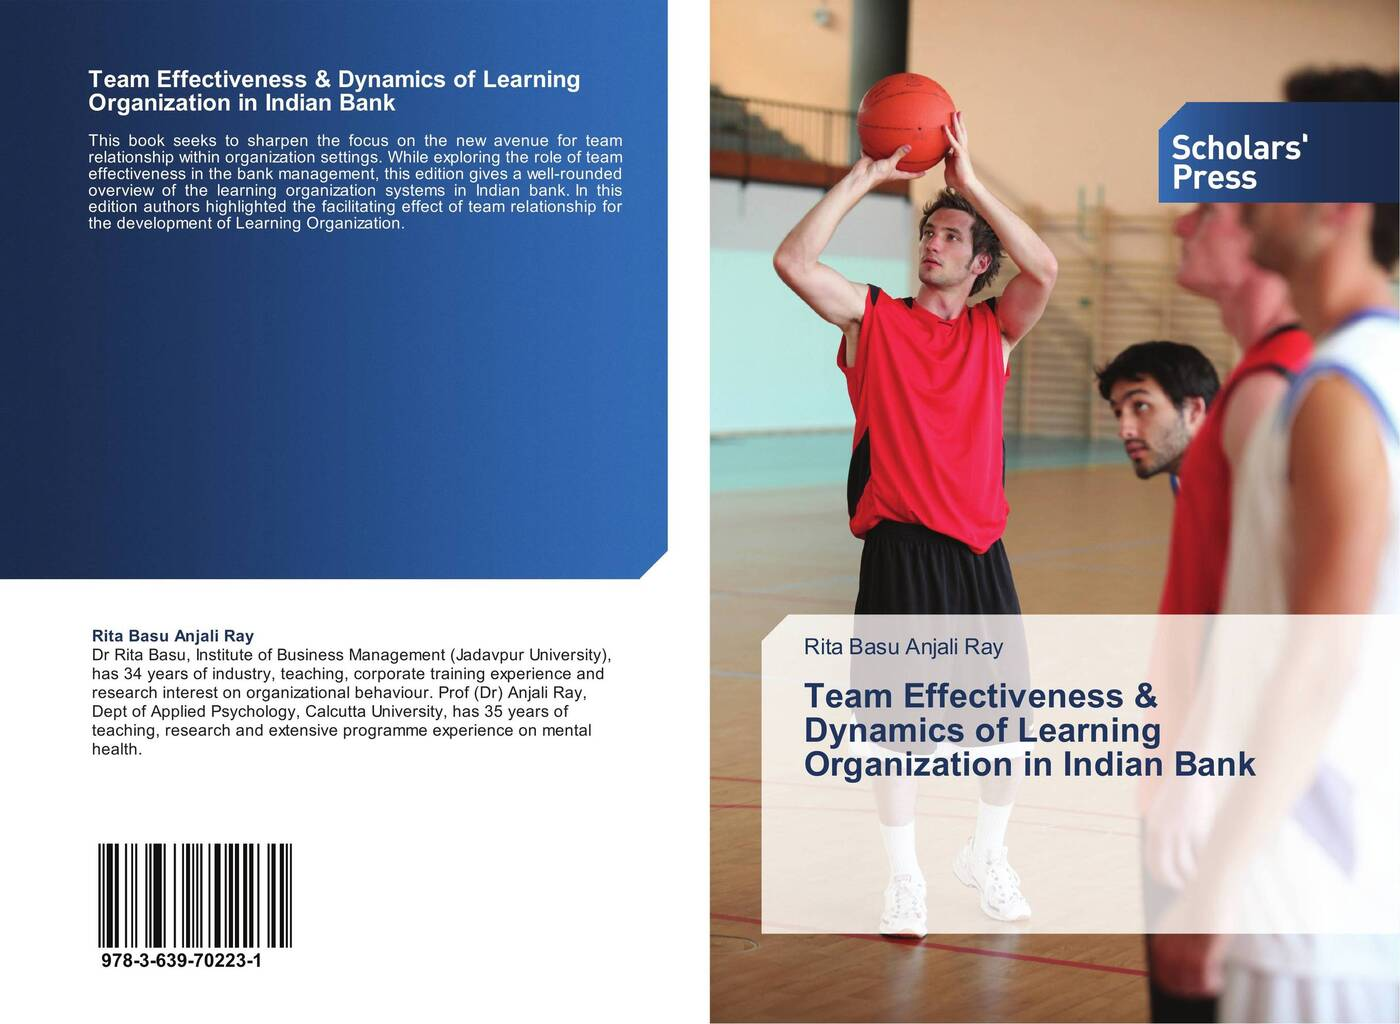 Rita Basu Anjali Ray Team Effectiveness & Dynamics of Learning Organization in Indian Bank dynamics of managerial effectiveness